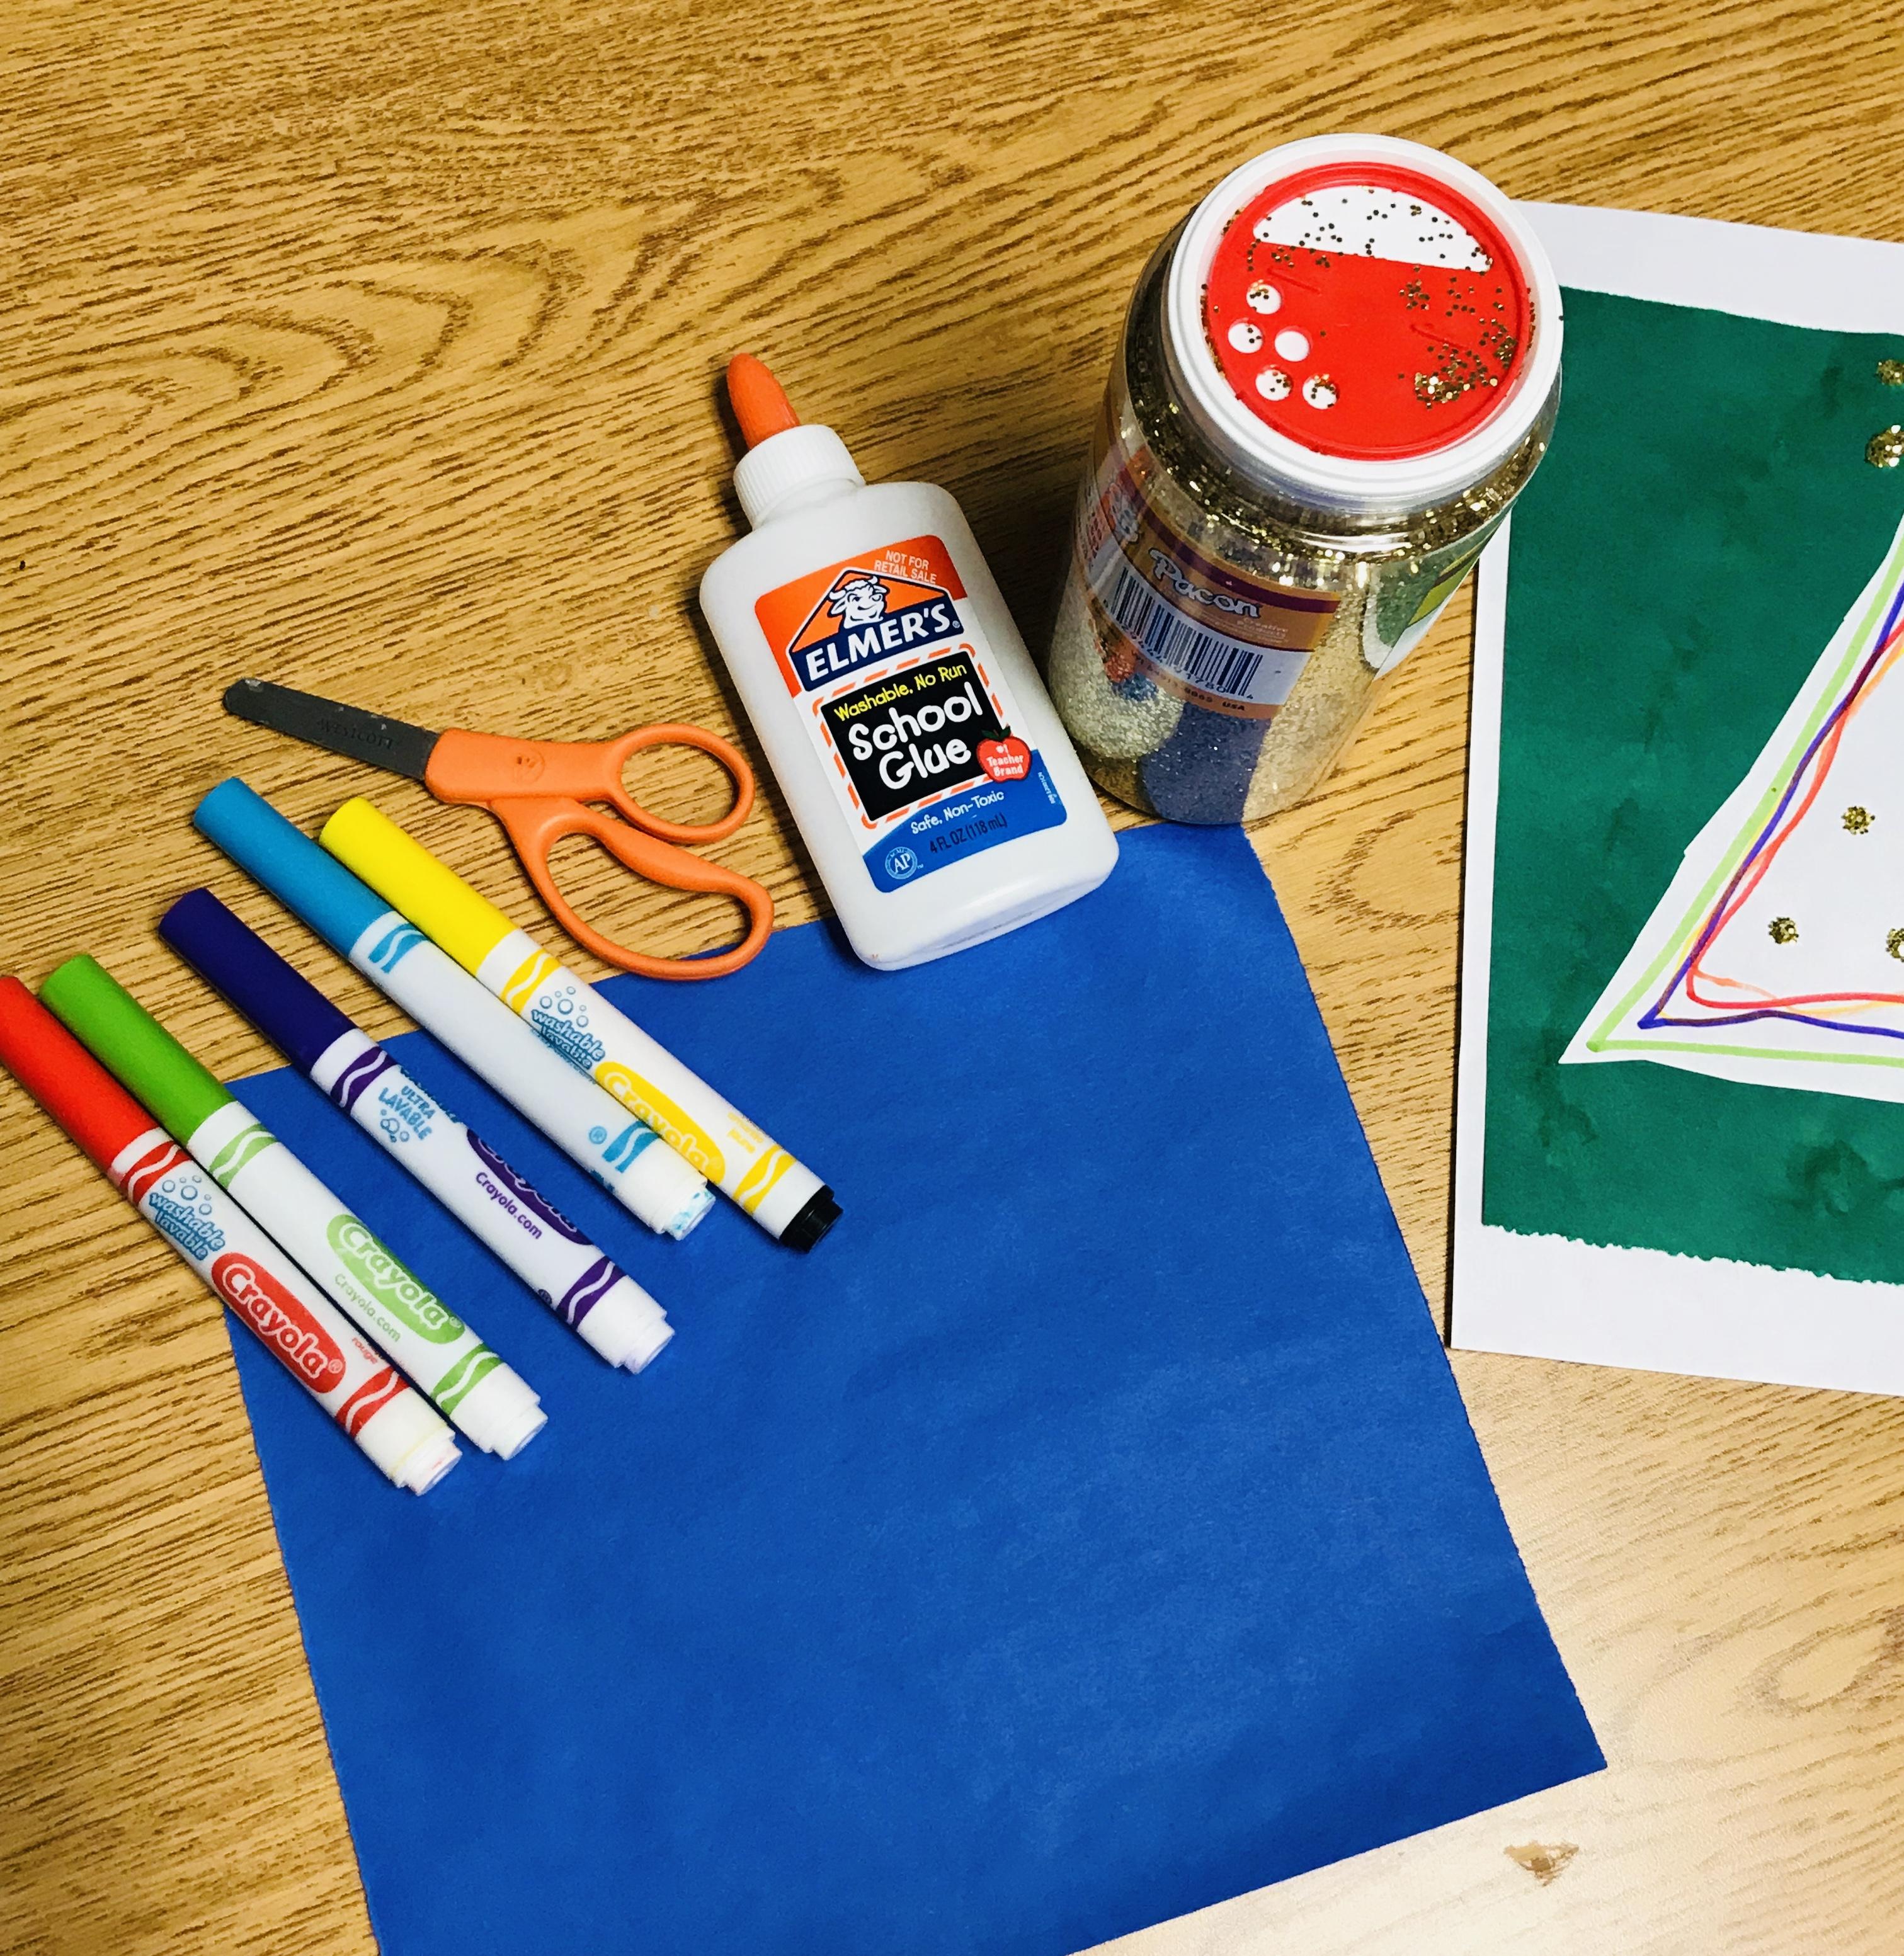 Markers, scissors, glue, glitter, and paper